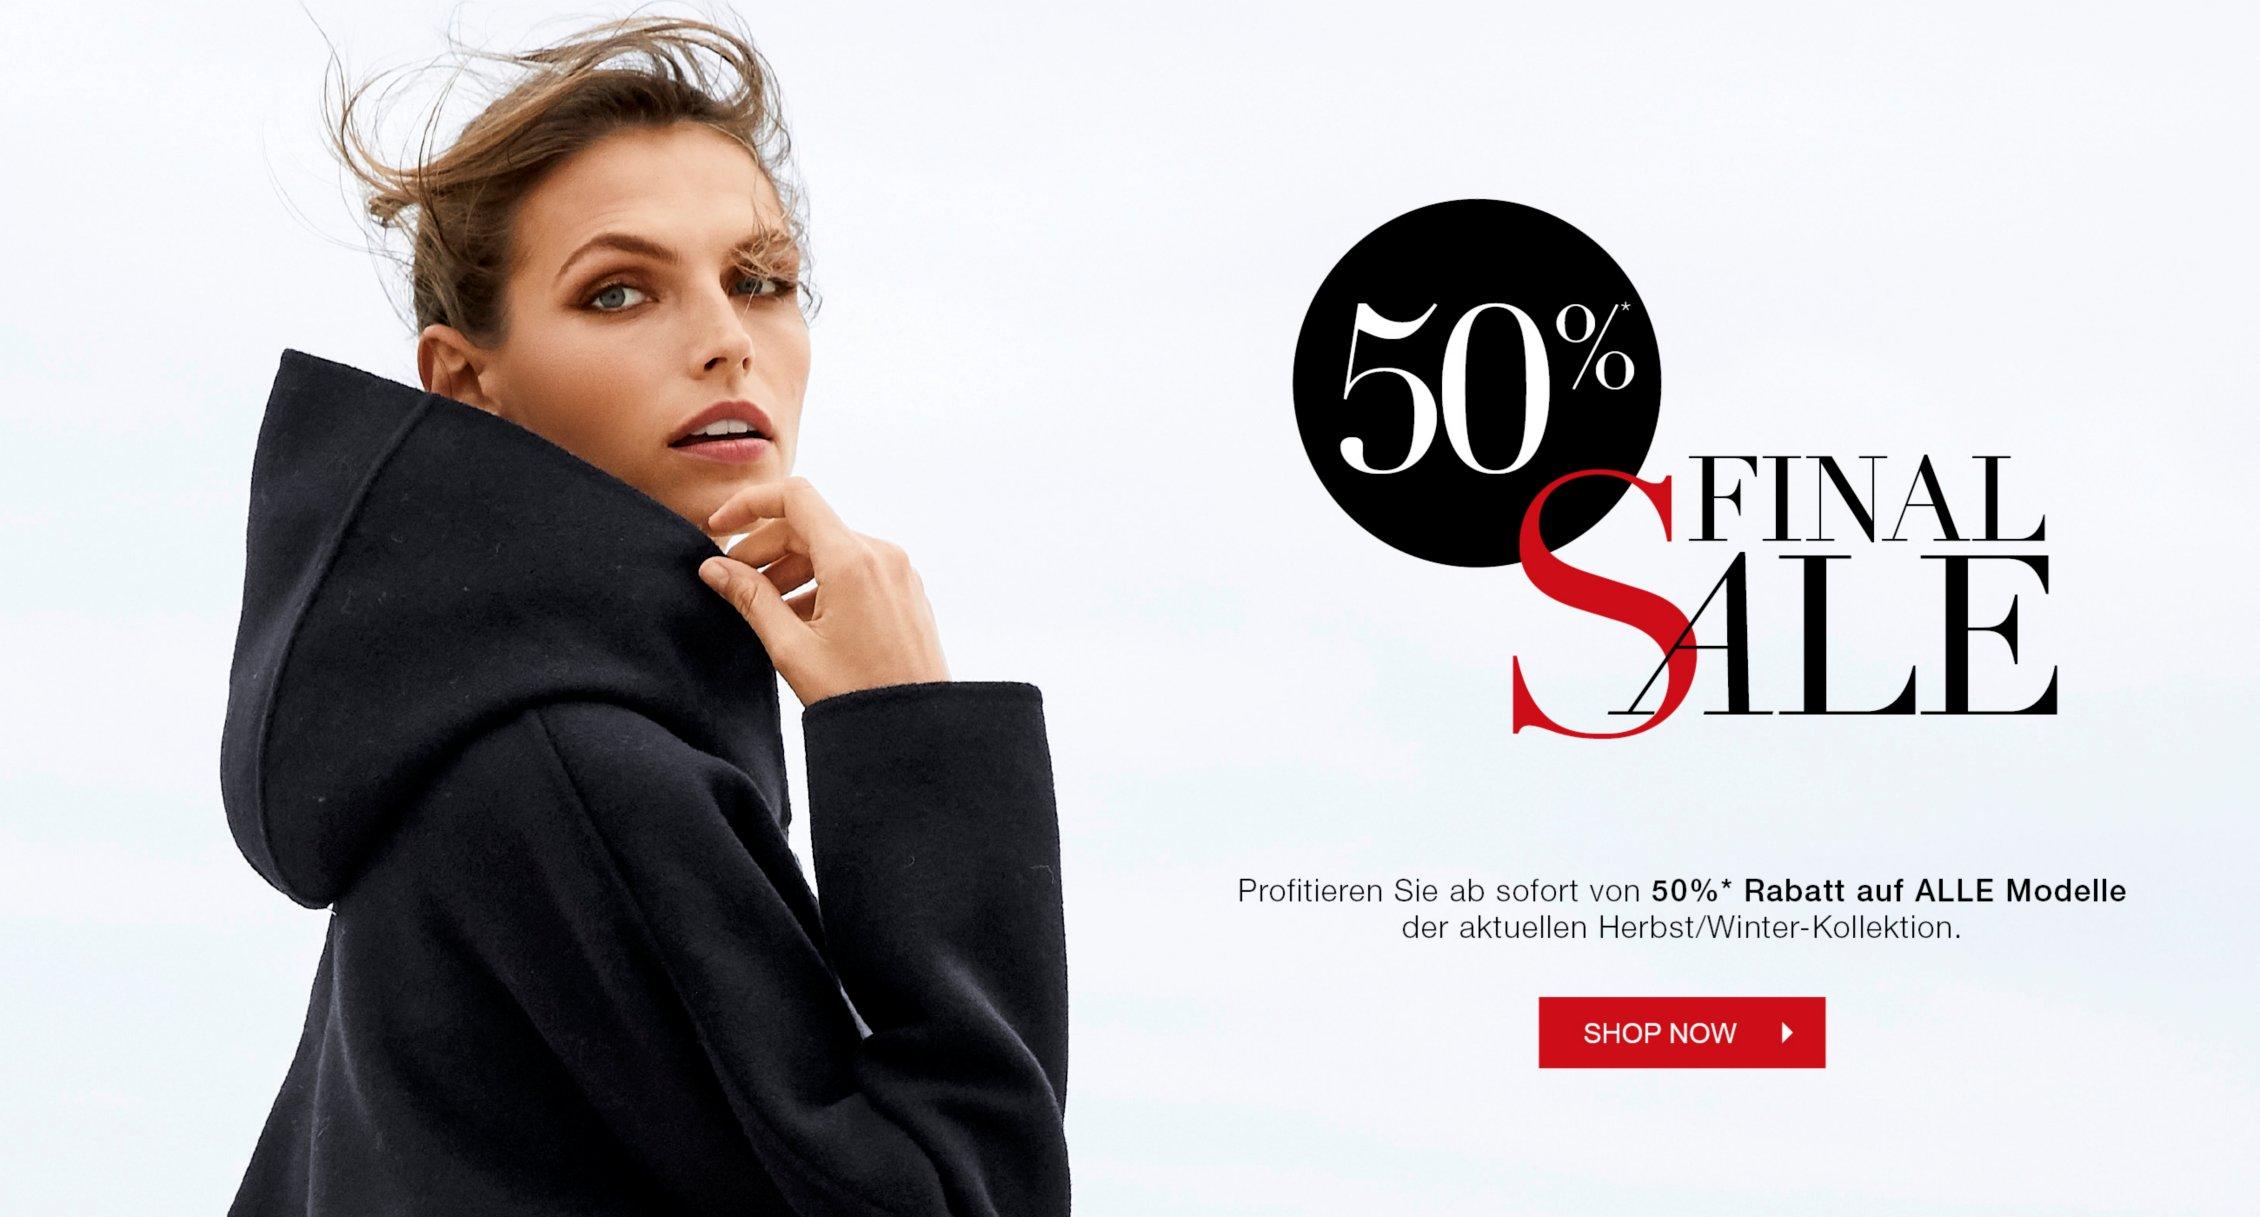 Final Sale 50%